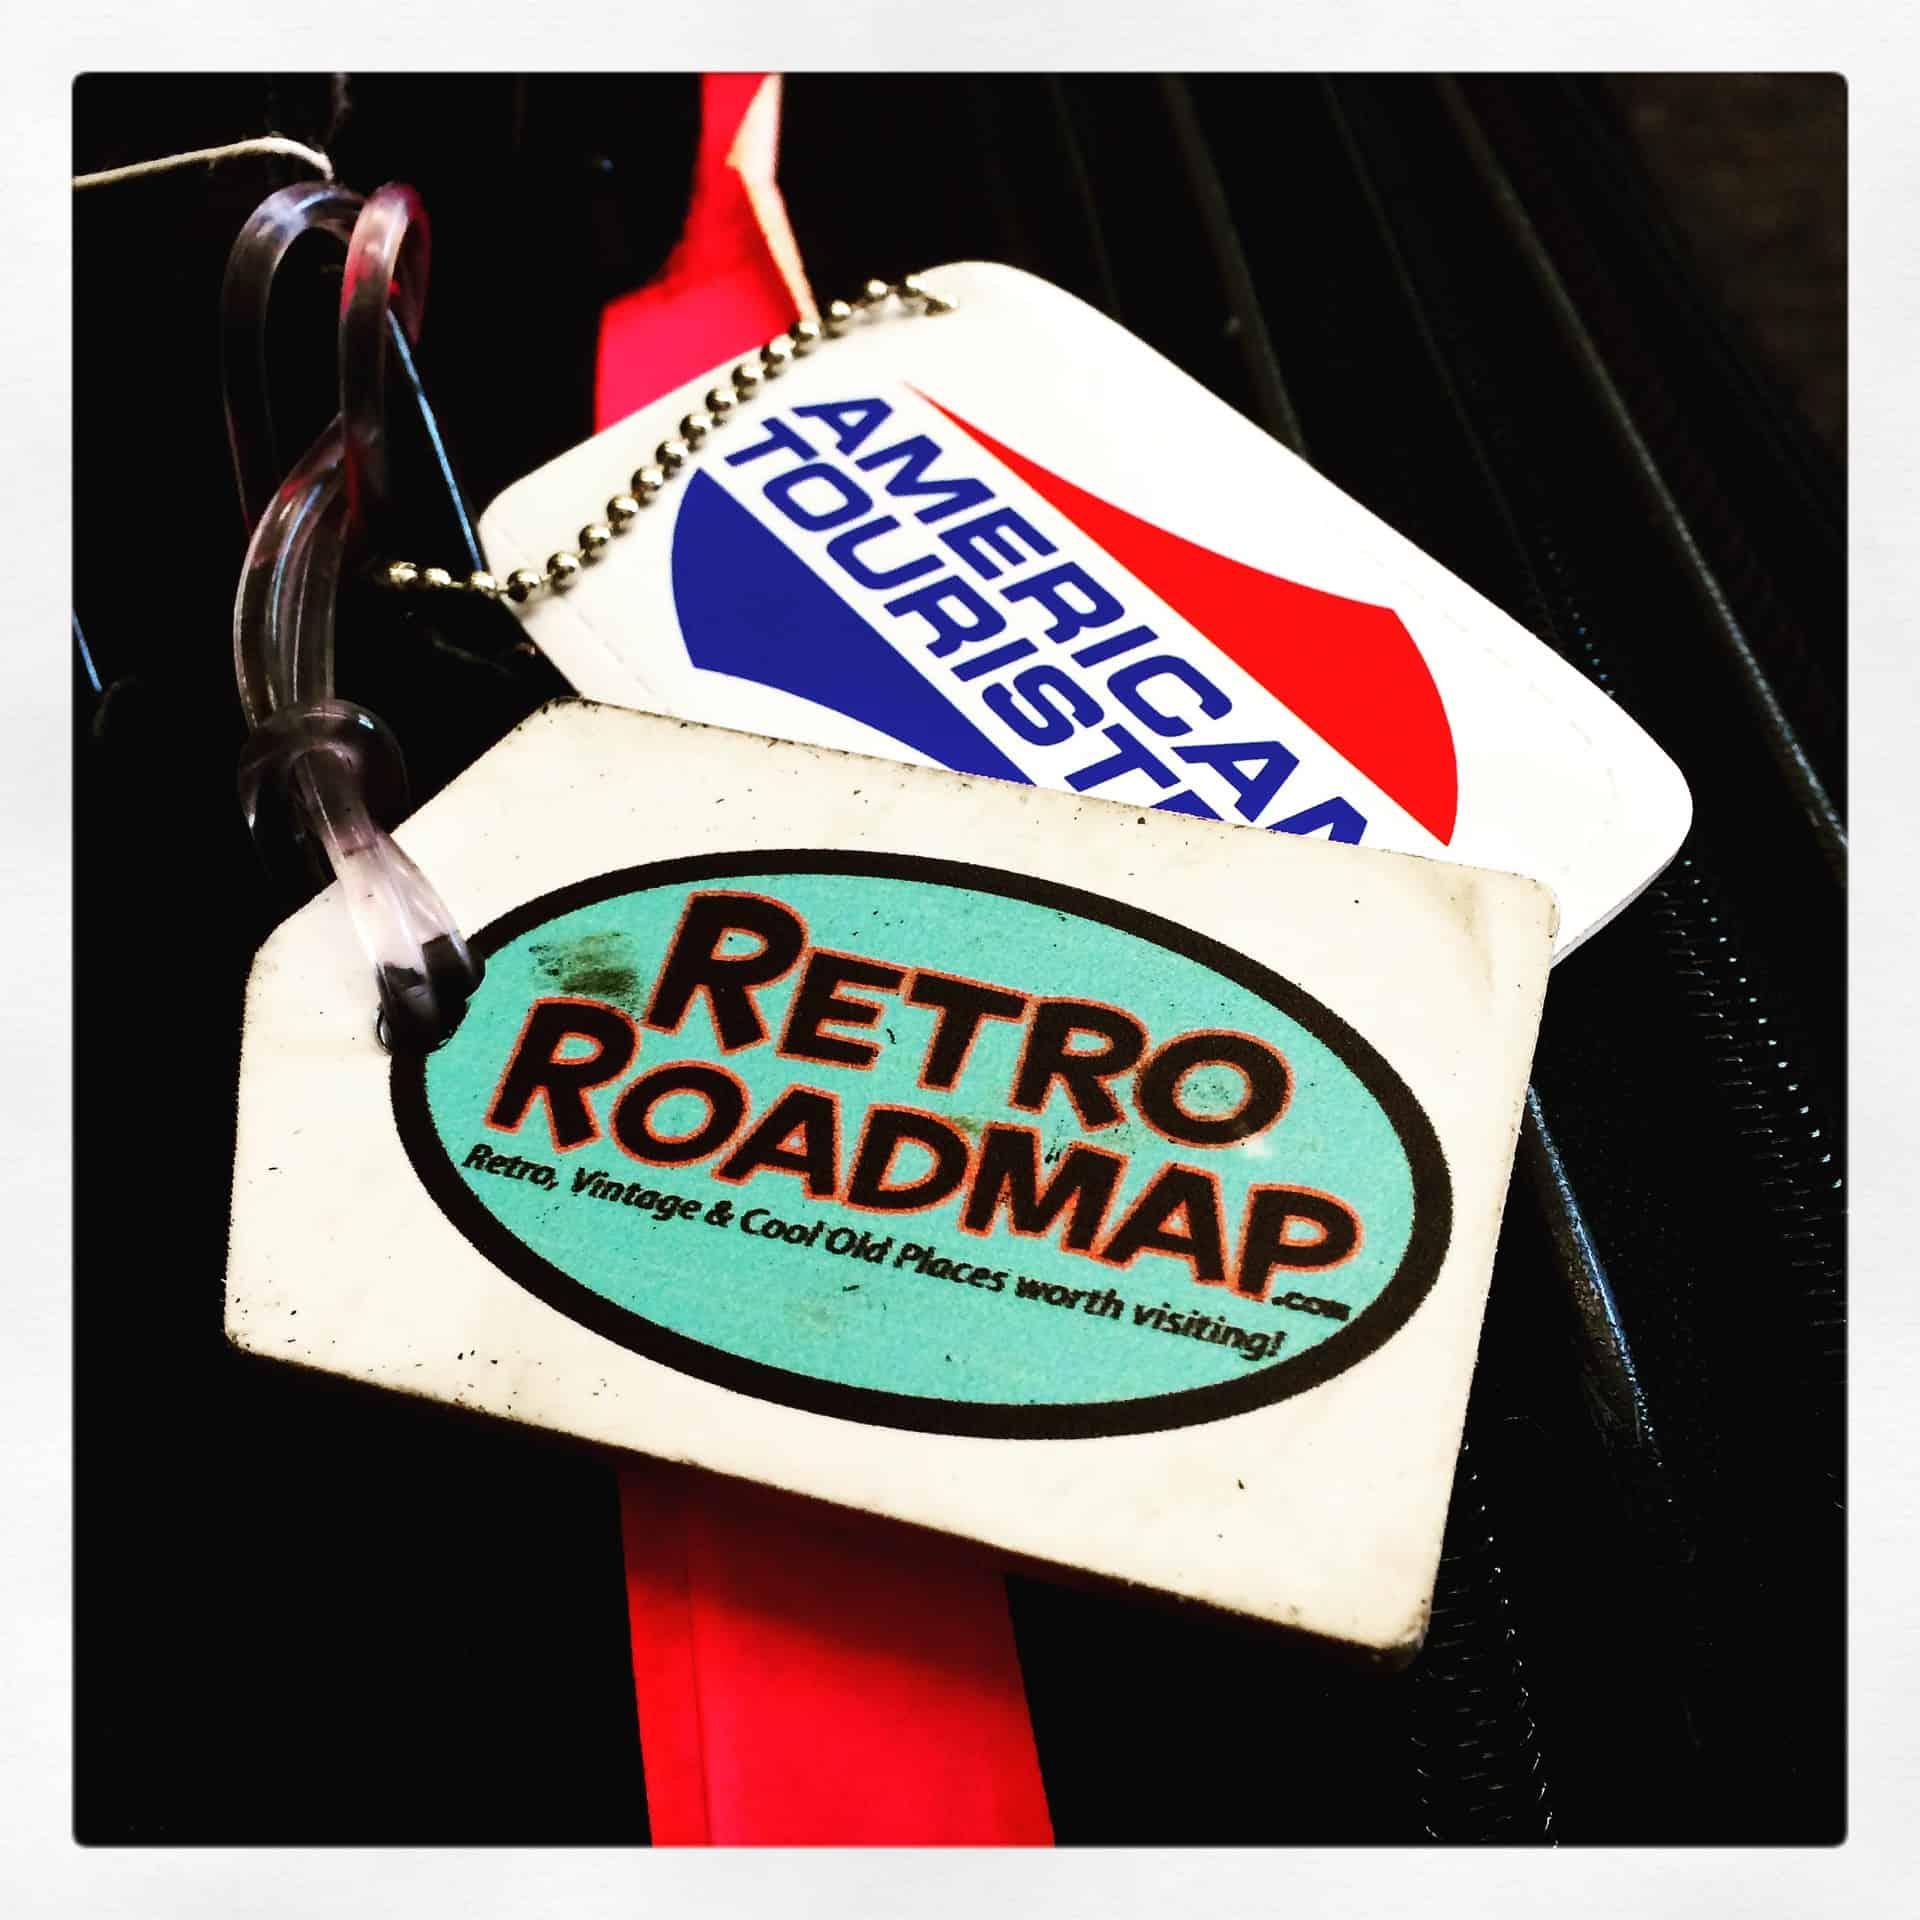 Retro Roadmap International Travel